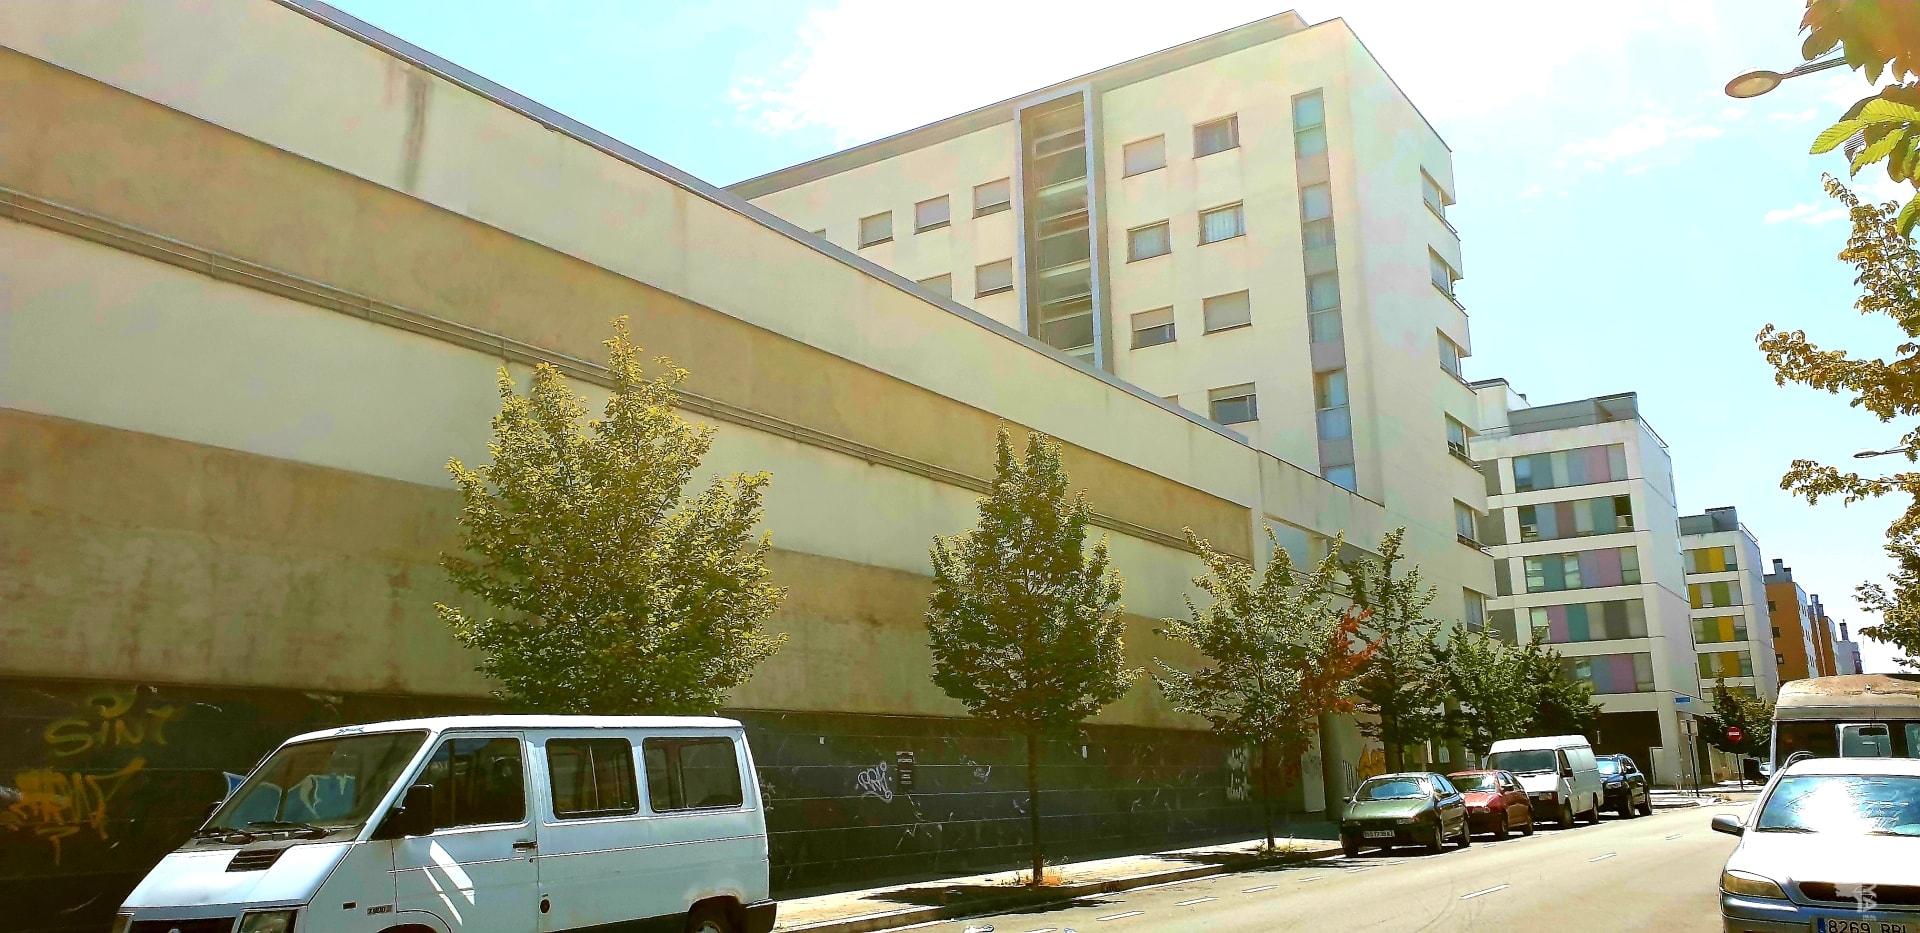 Parking en venta en Salburua, Vitoria-gasteiz, Álava, Calle Viena, 6.100 €, 26 m2